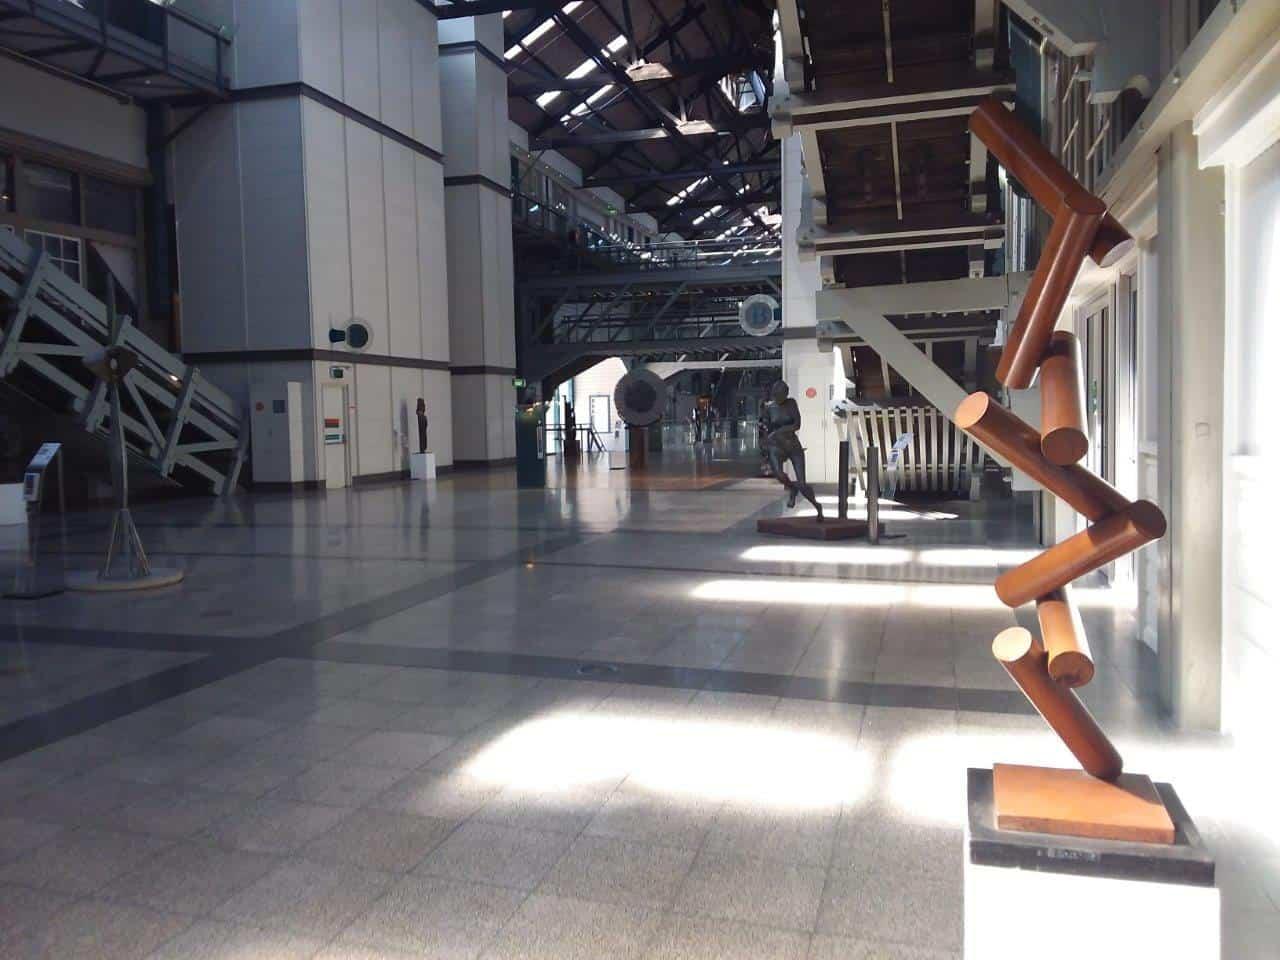 Dropped-140cm-BRONZE-[bronze,tabletop,outdoor]-alex-shiebner-australian-sculpture-geometric-art-balance-gravity-motif